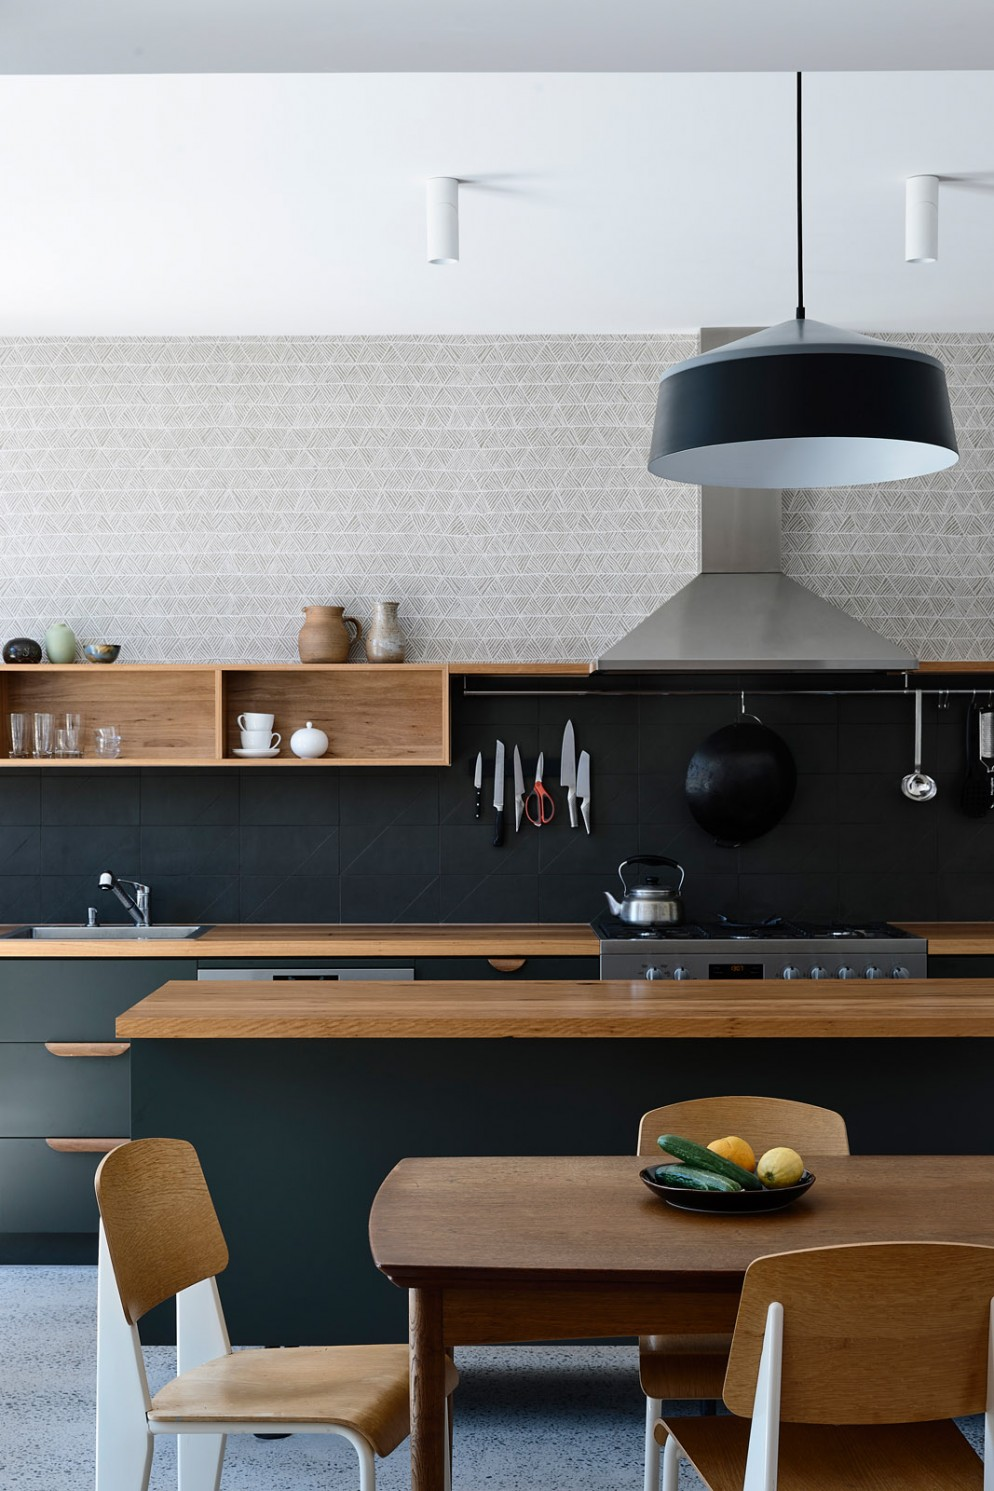 06 AMA-Terracotta_House_Derek_Swalwell